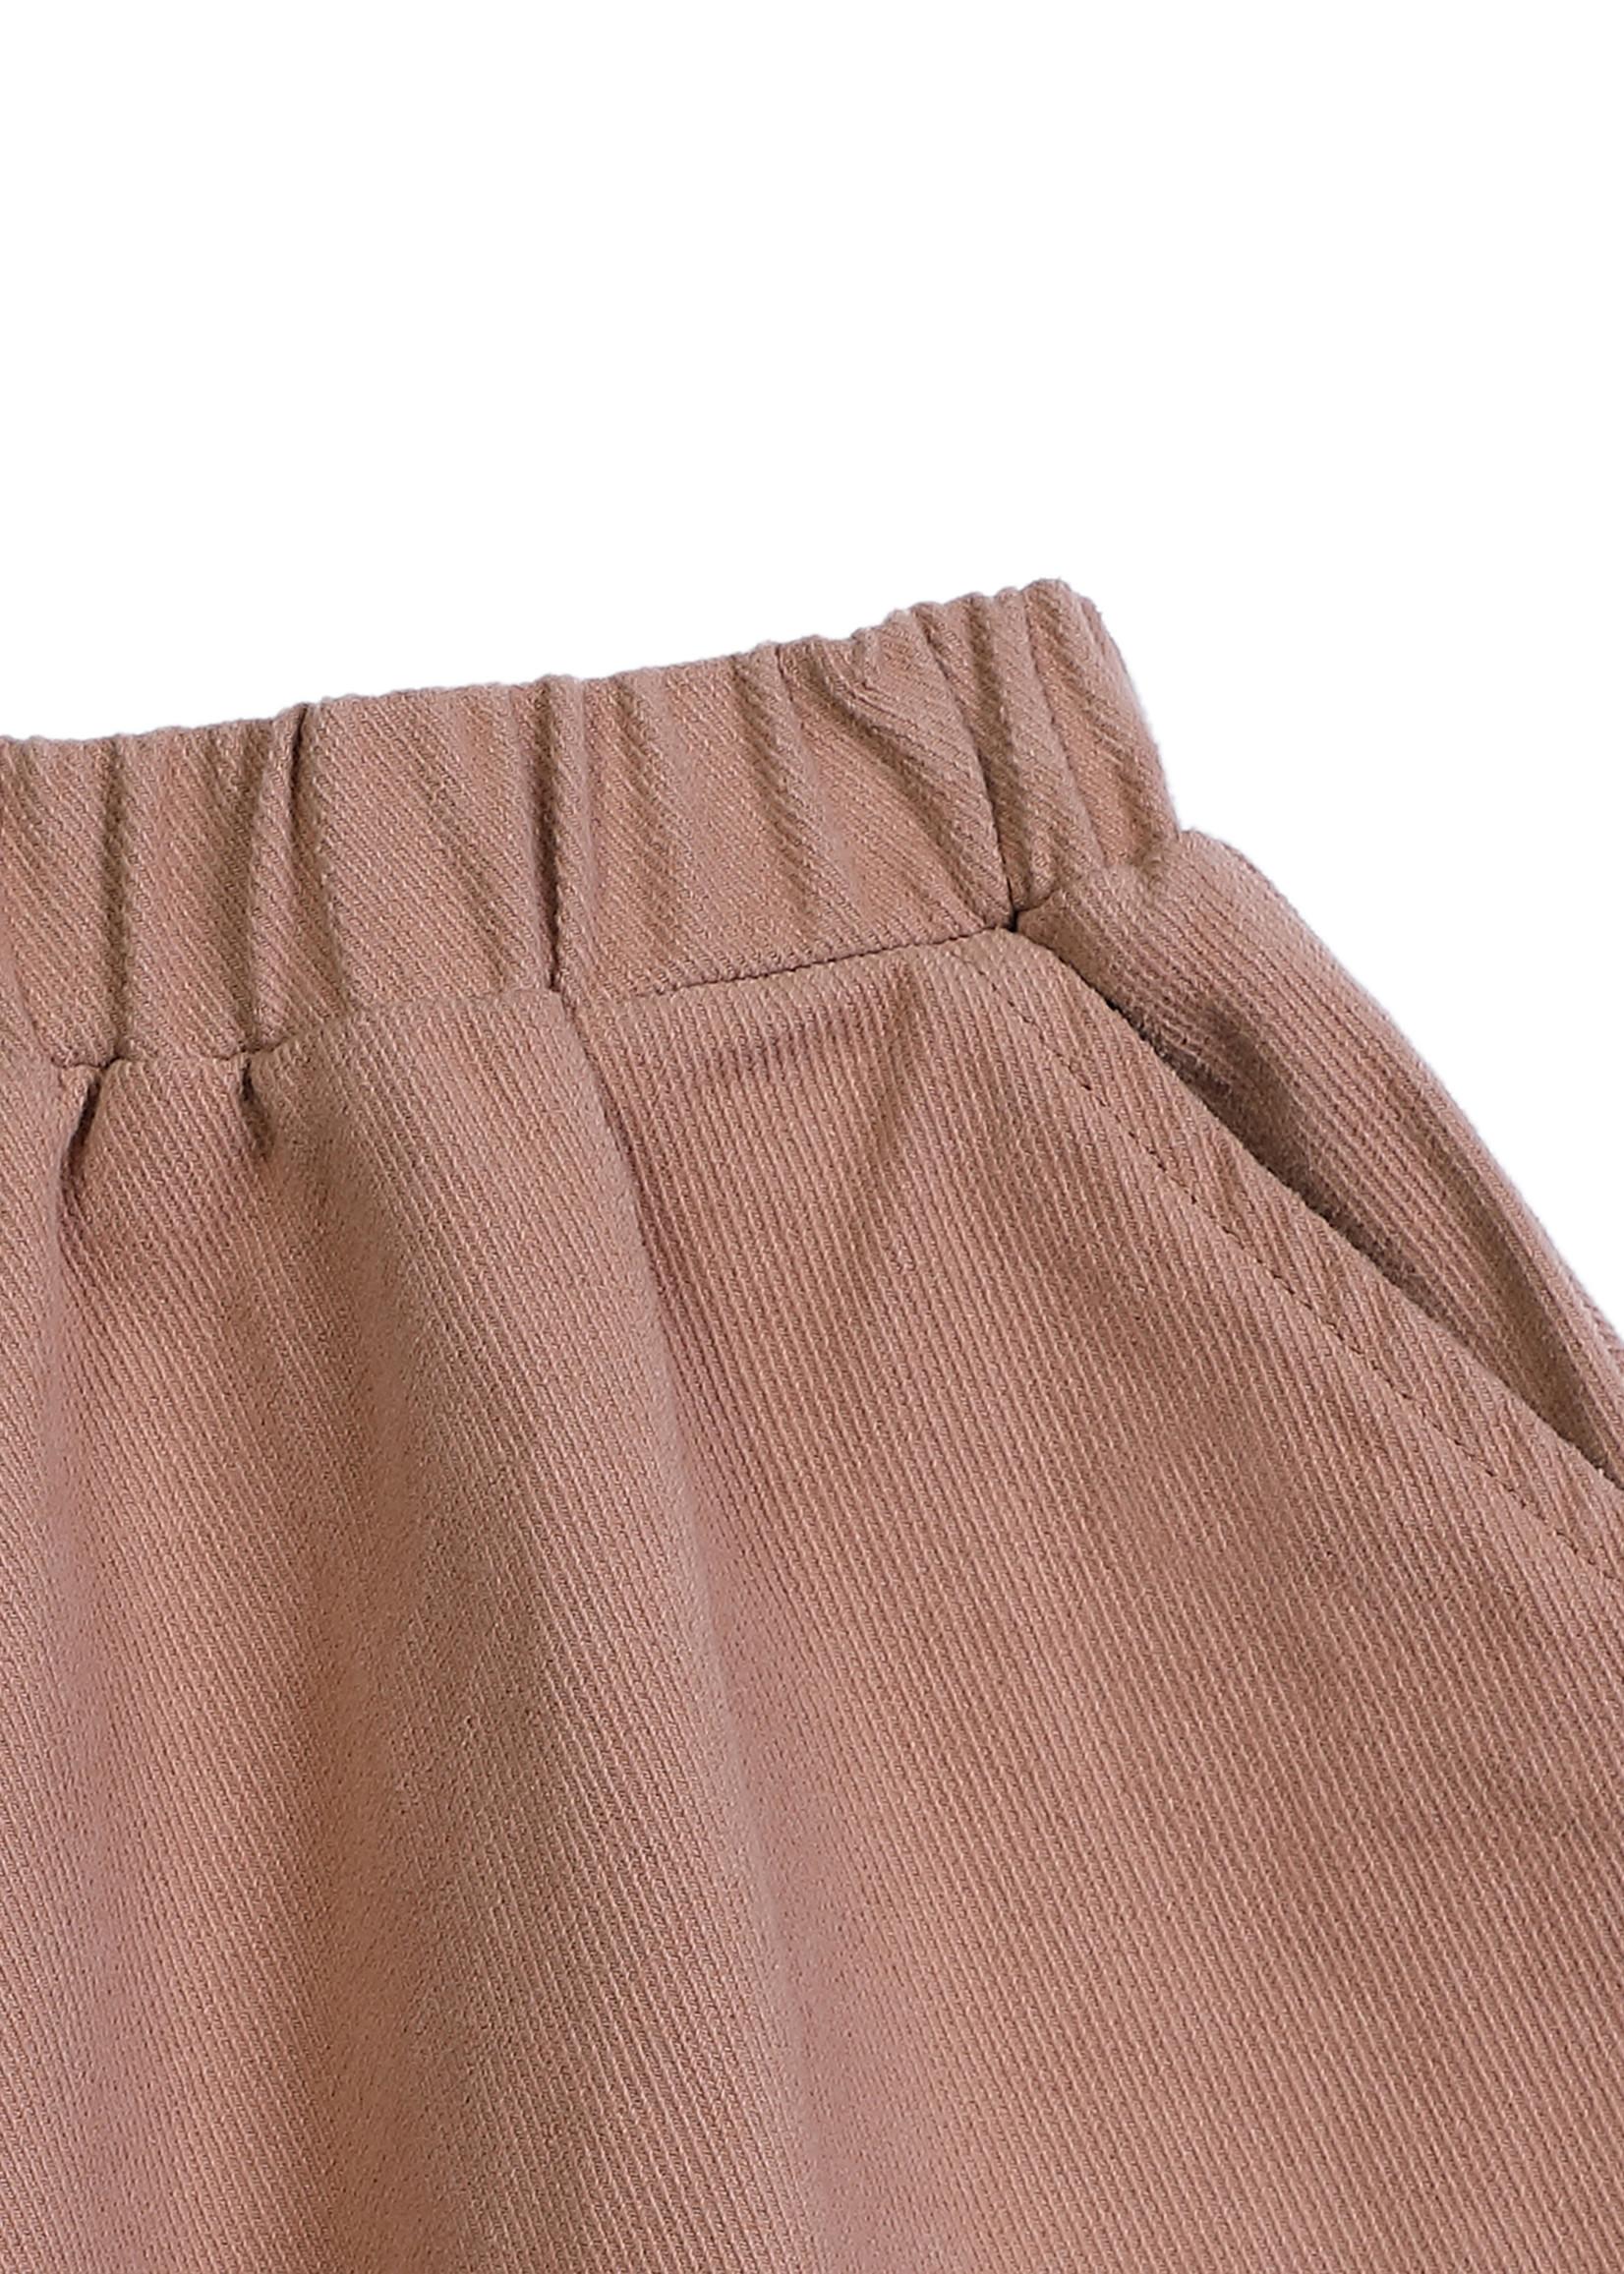 Donsje Amsterdam Cees Skirt - Vintage Pink